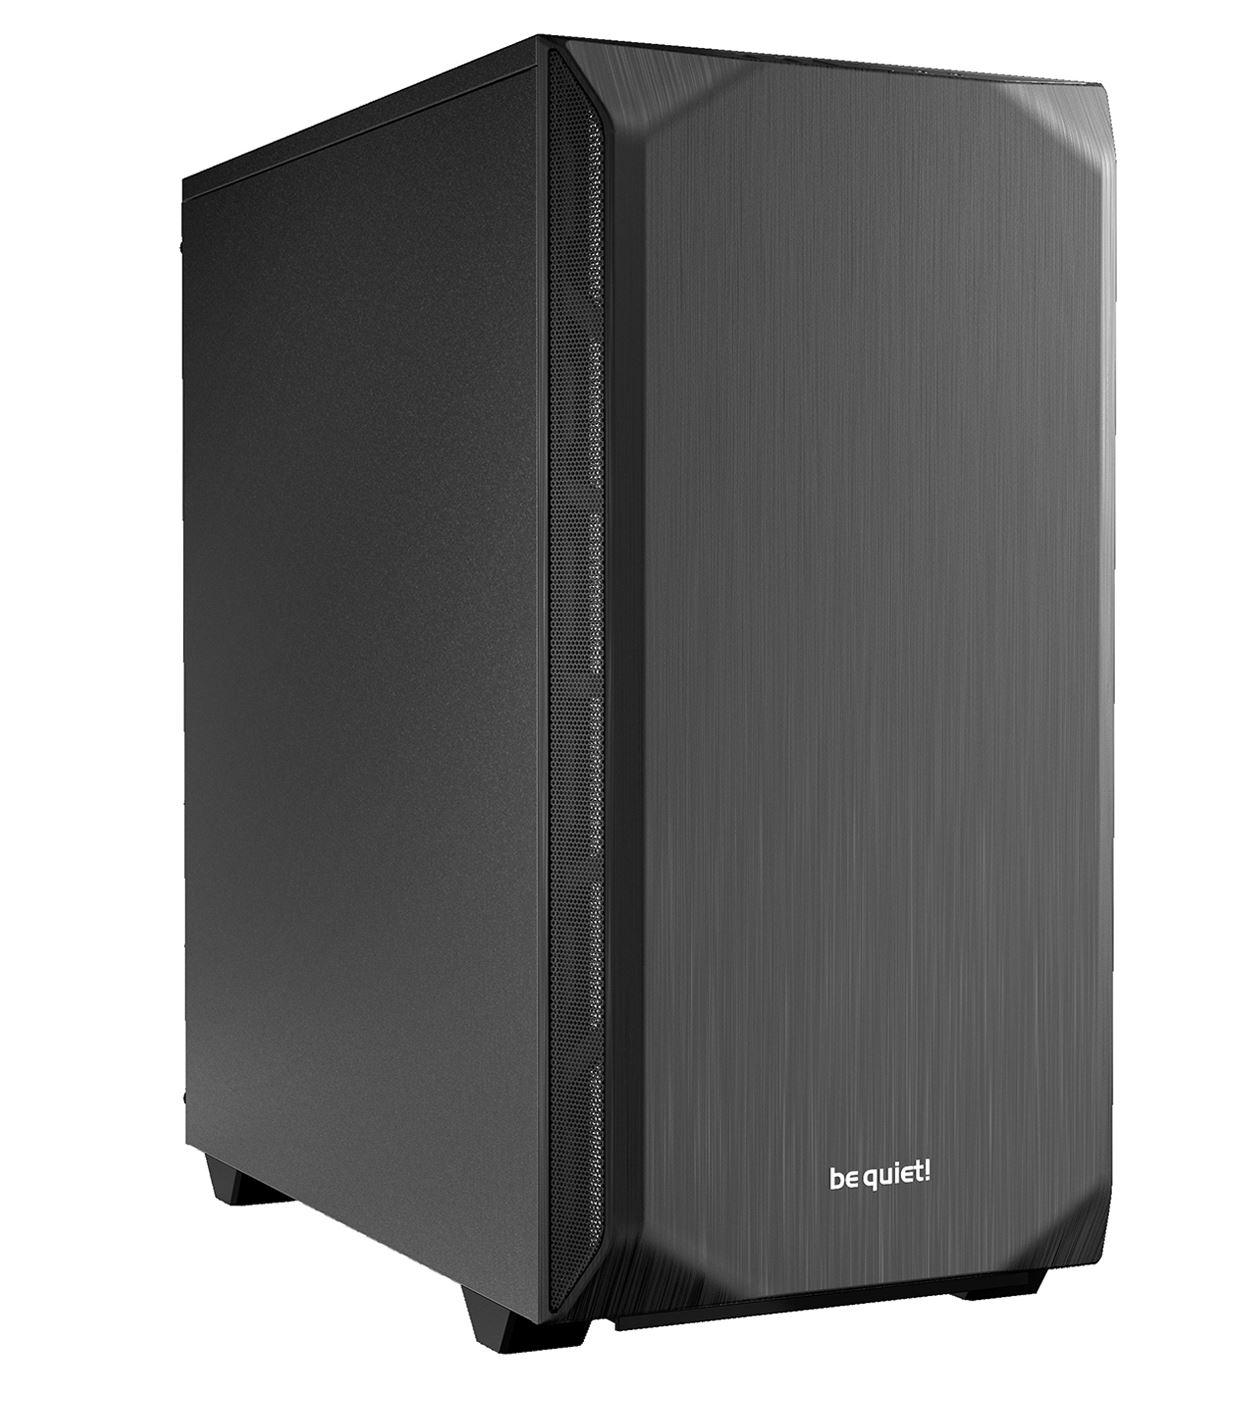 Epsilon Deluxe Systeem, Ryzen 5, 8 GB, 512 GB SSD, Windows 10 Pro